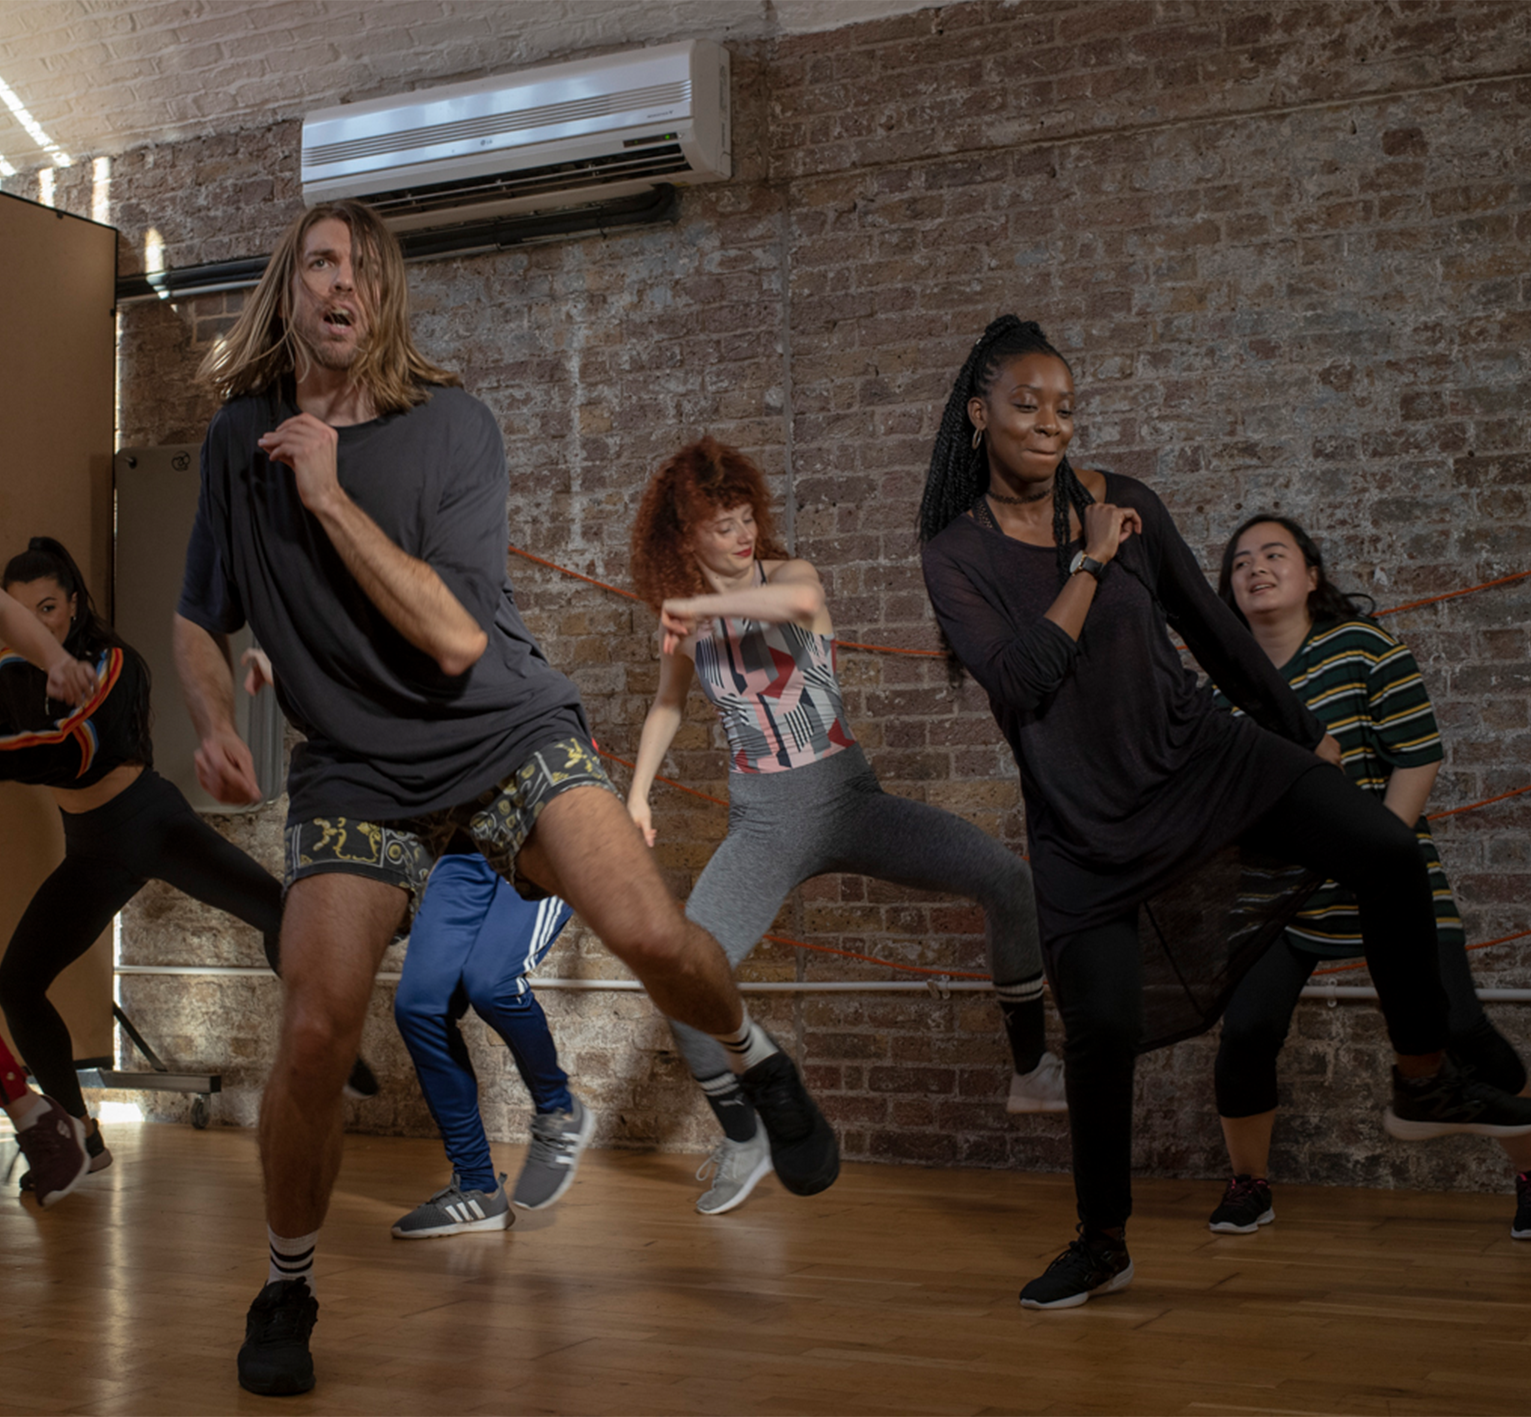 Music Video Dance Fitness Classes Frame